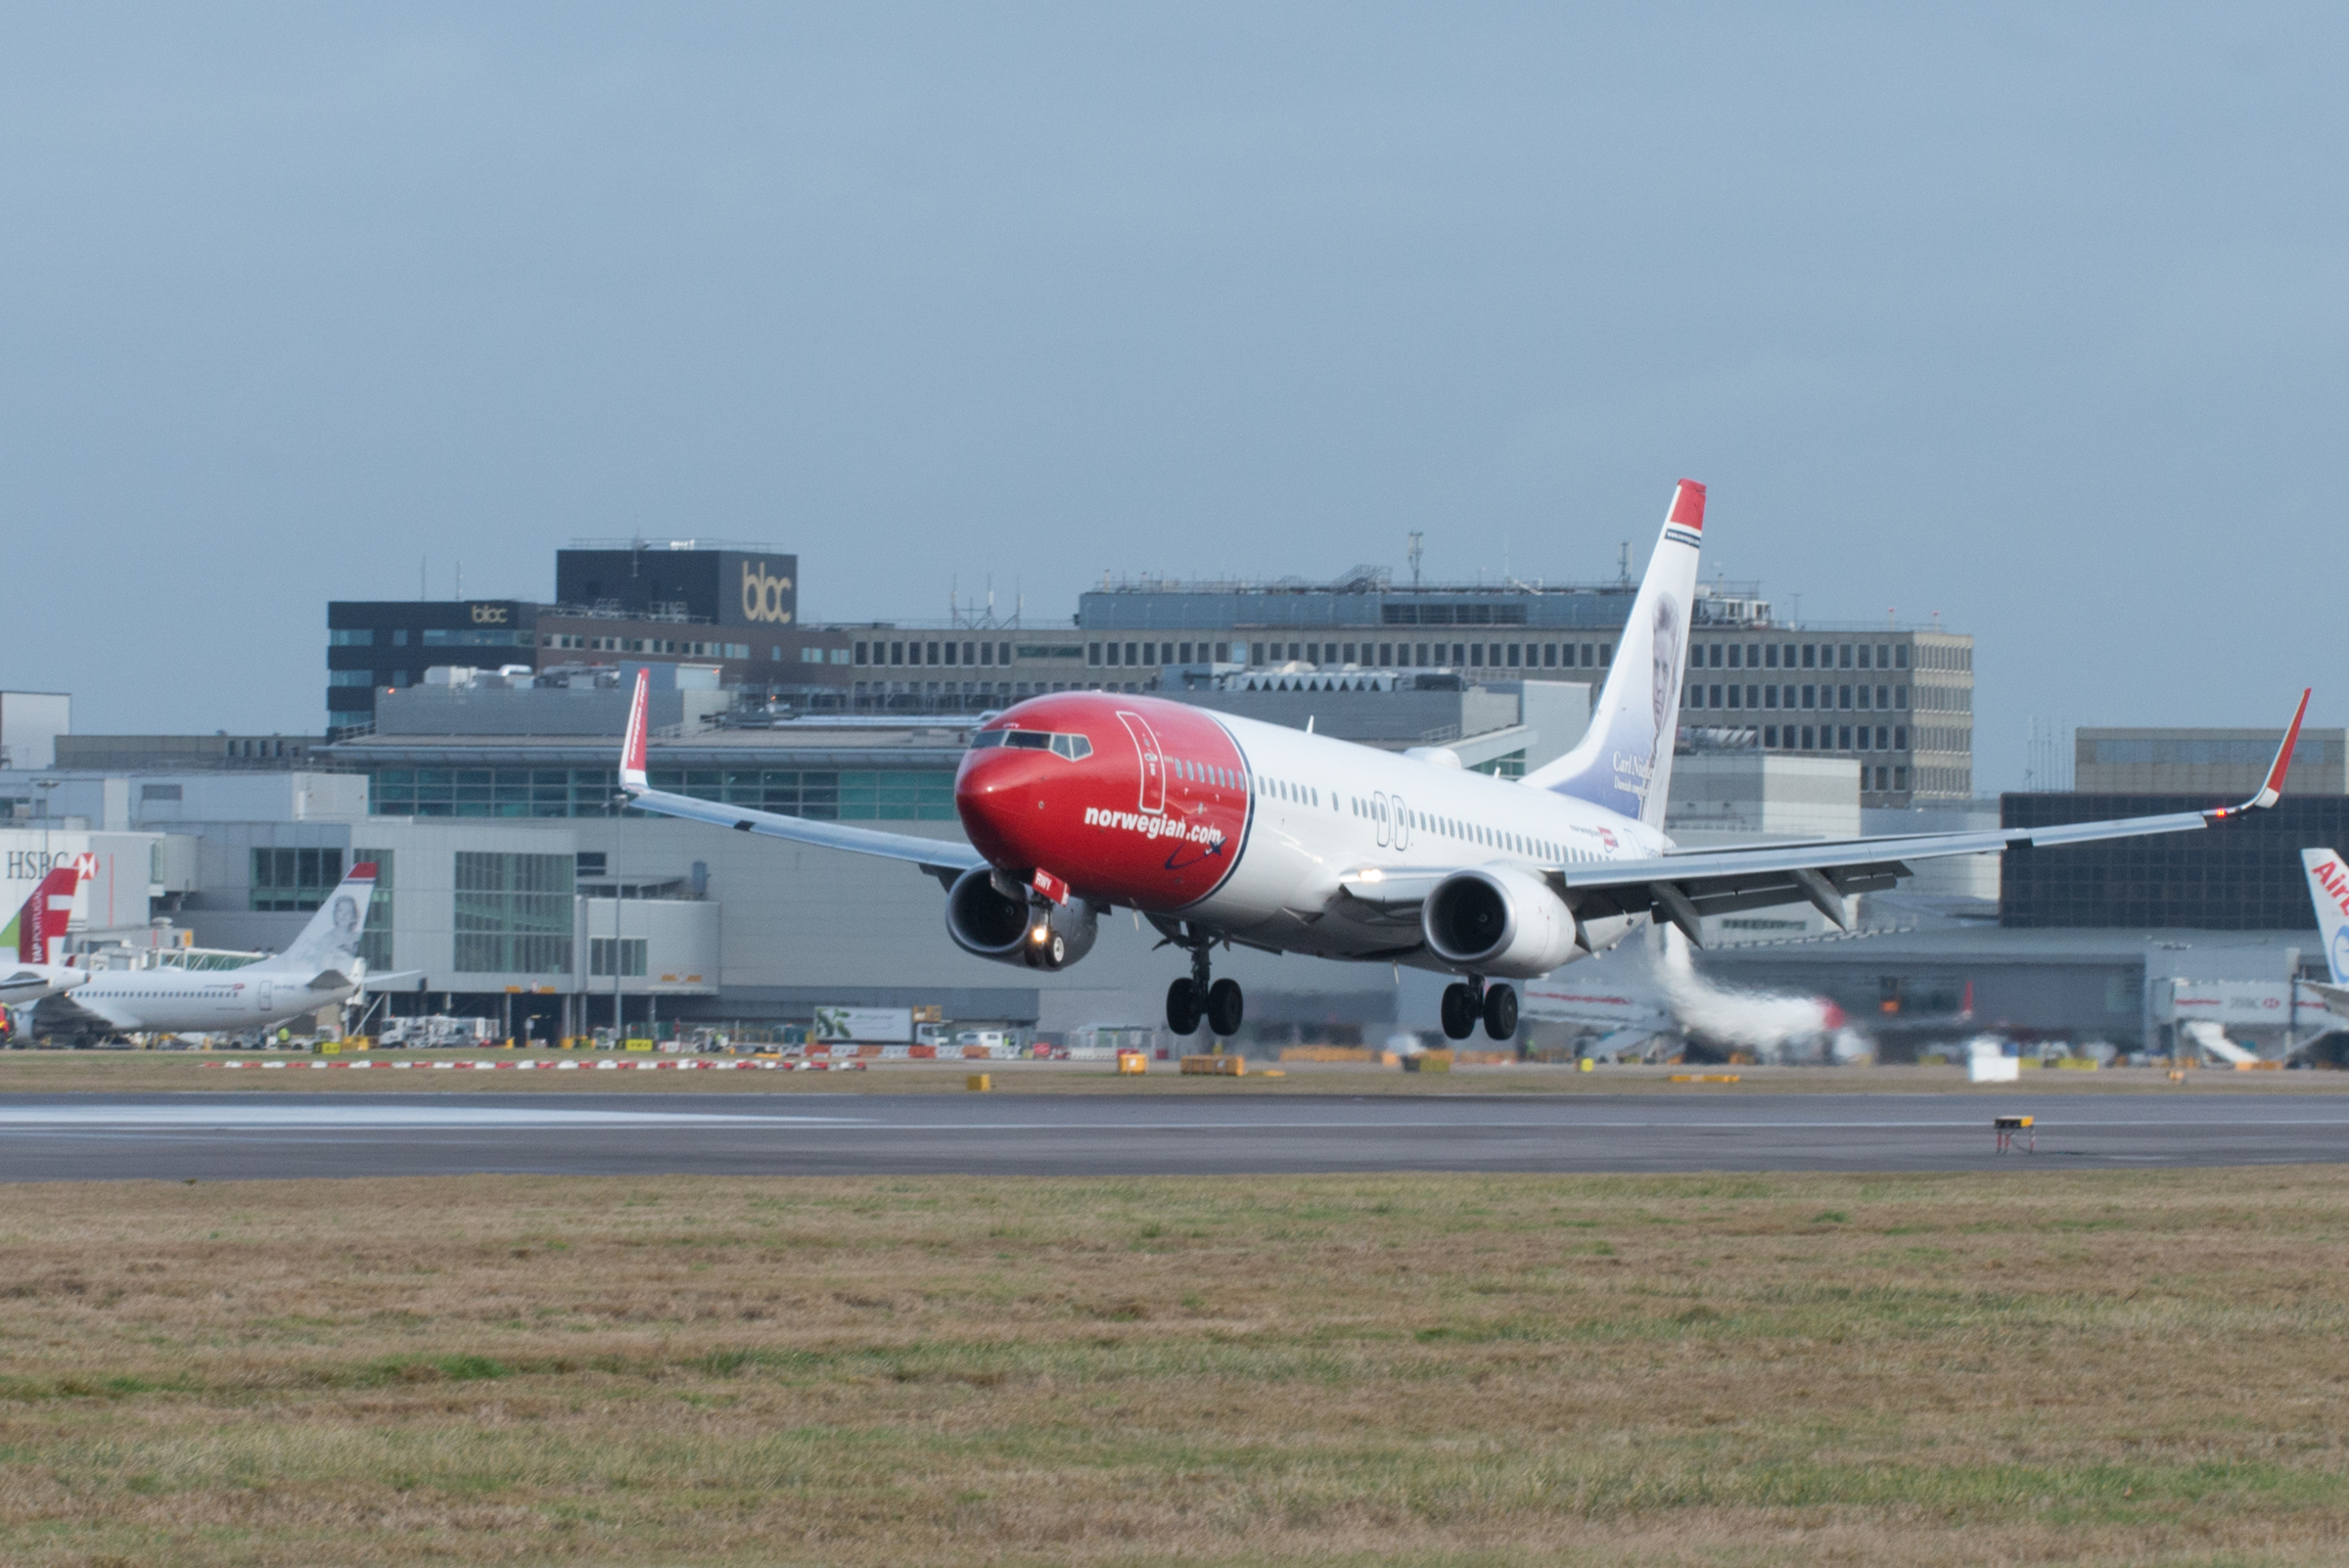 Norwegian to restore some European short-haul flights from July